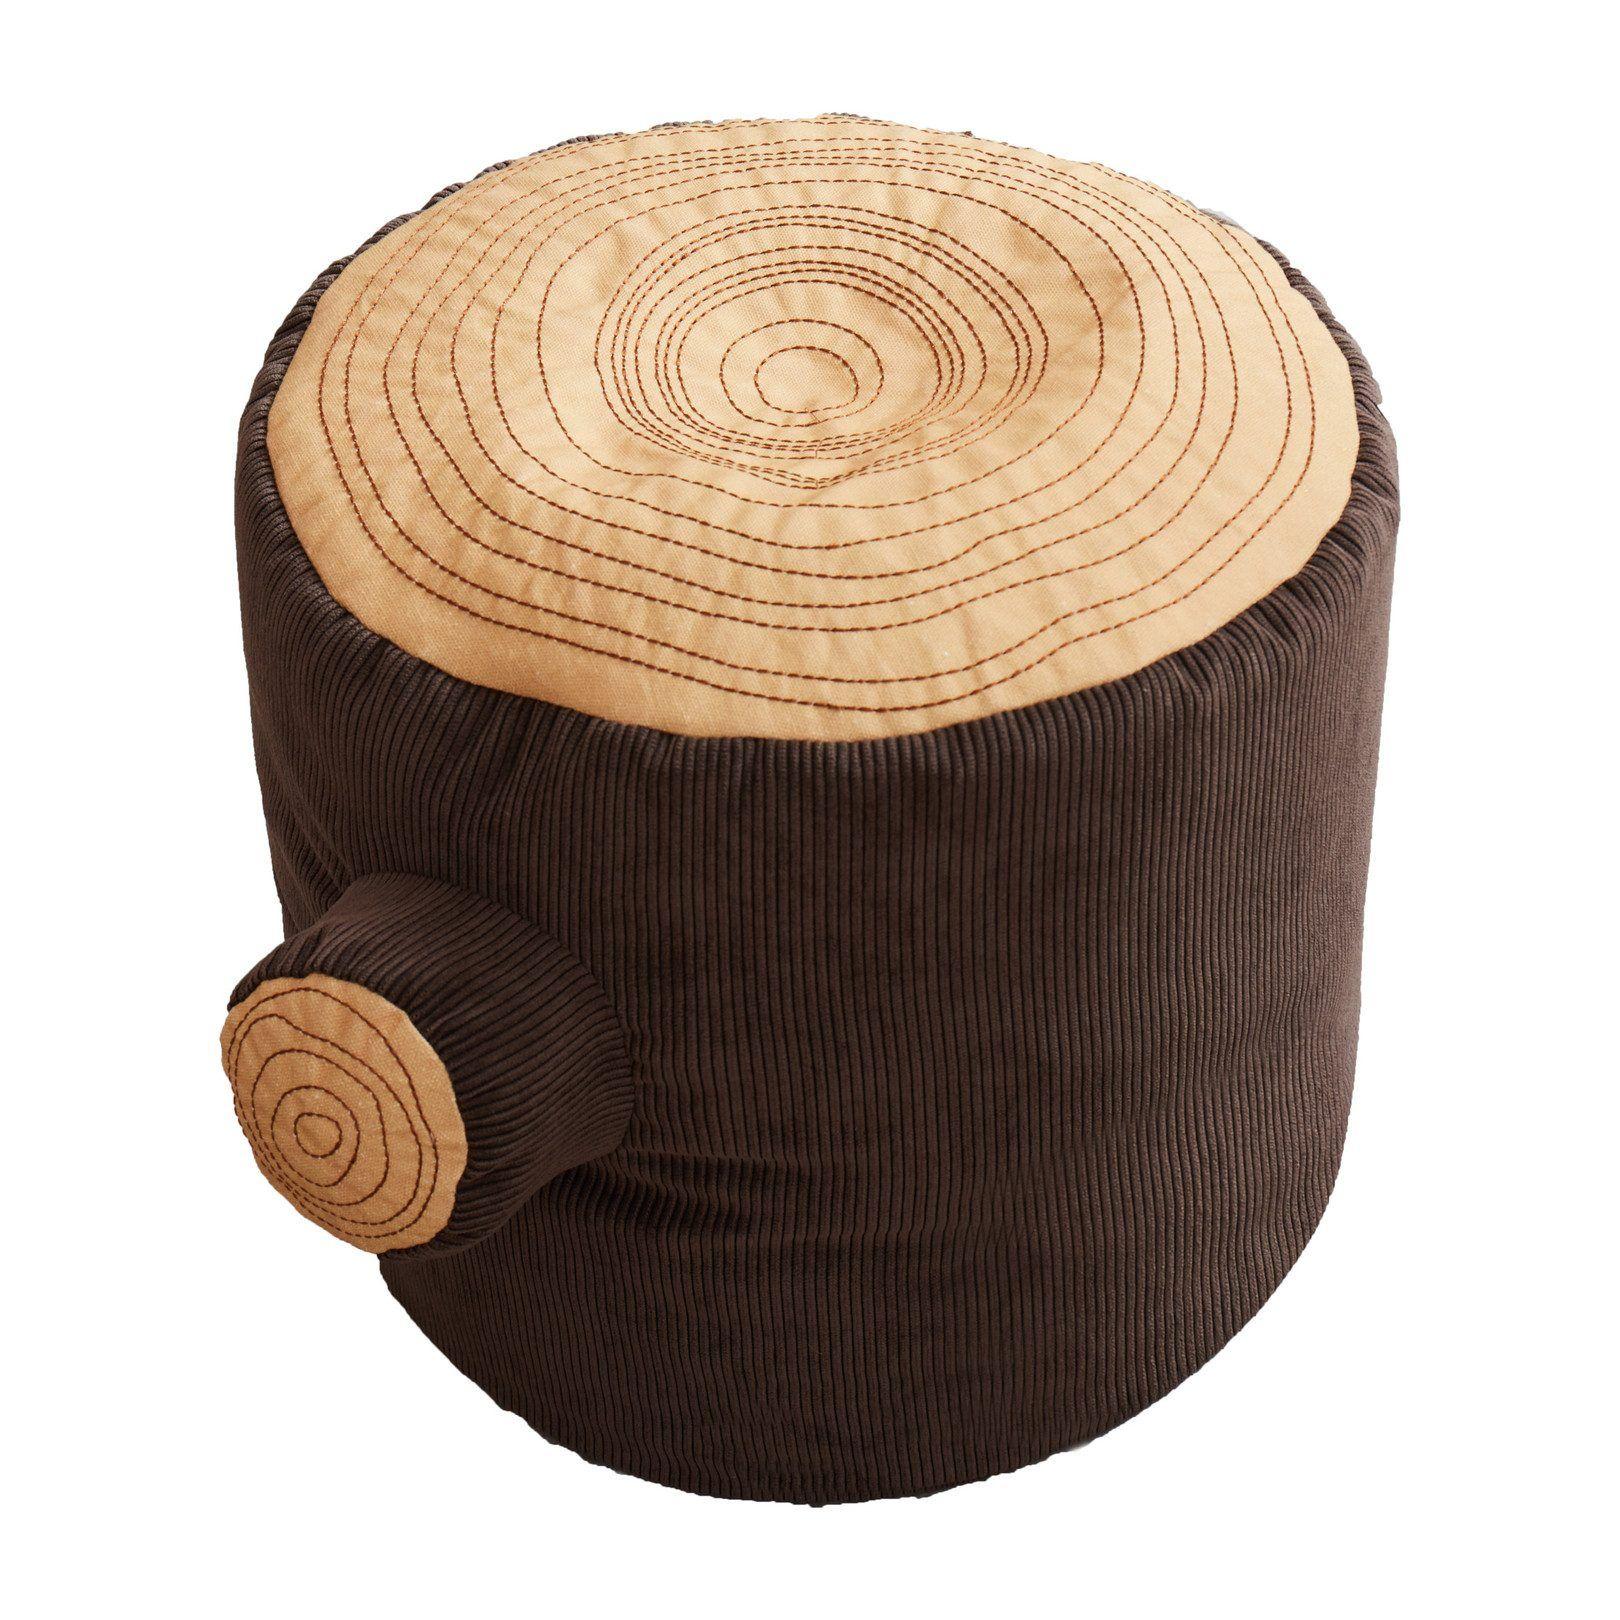 Asweets tree stump pouf kids seating toy trees tree stump